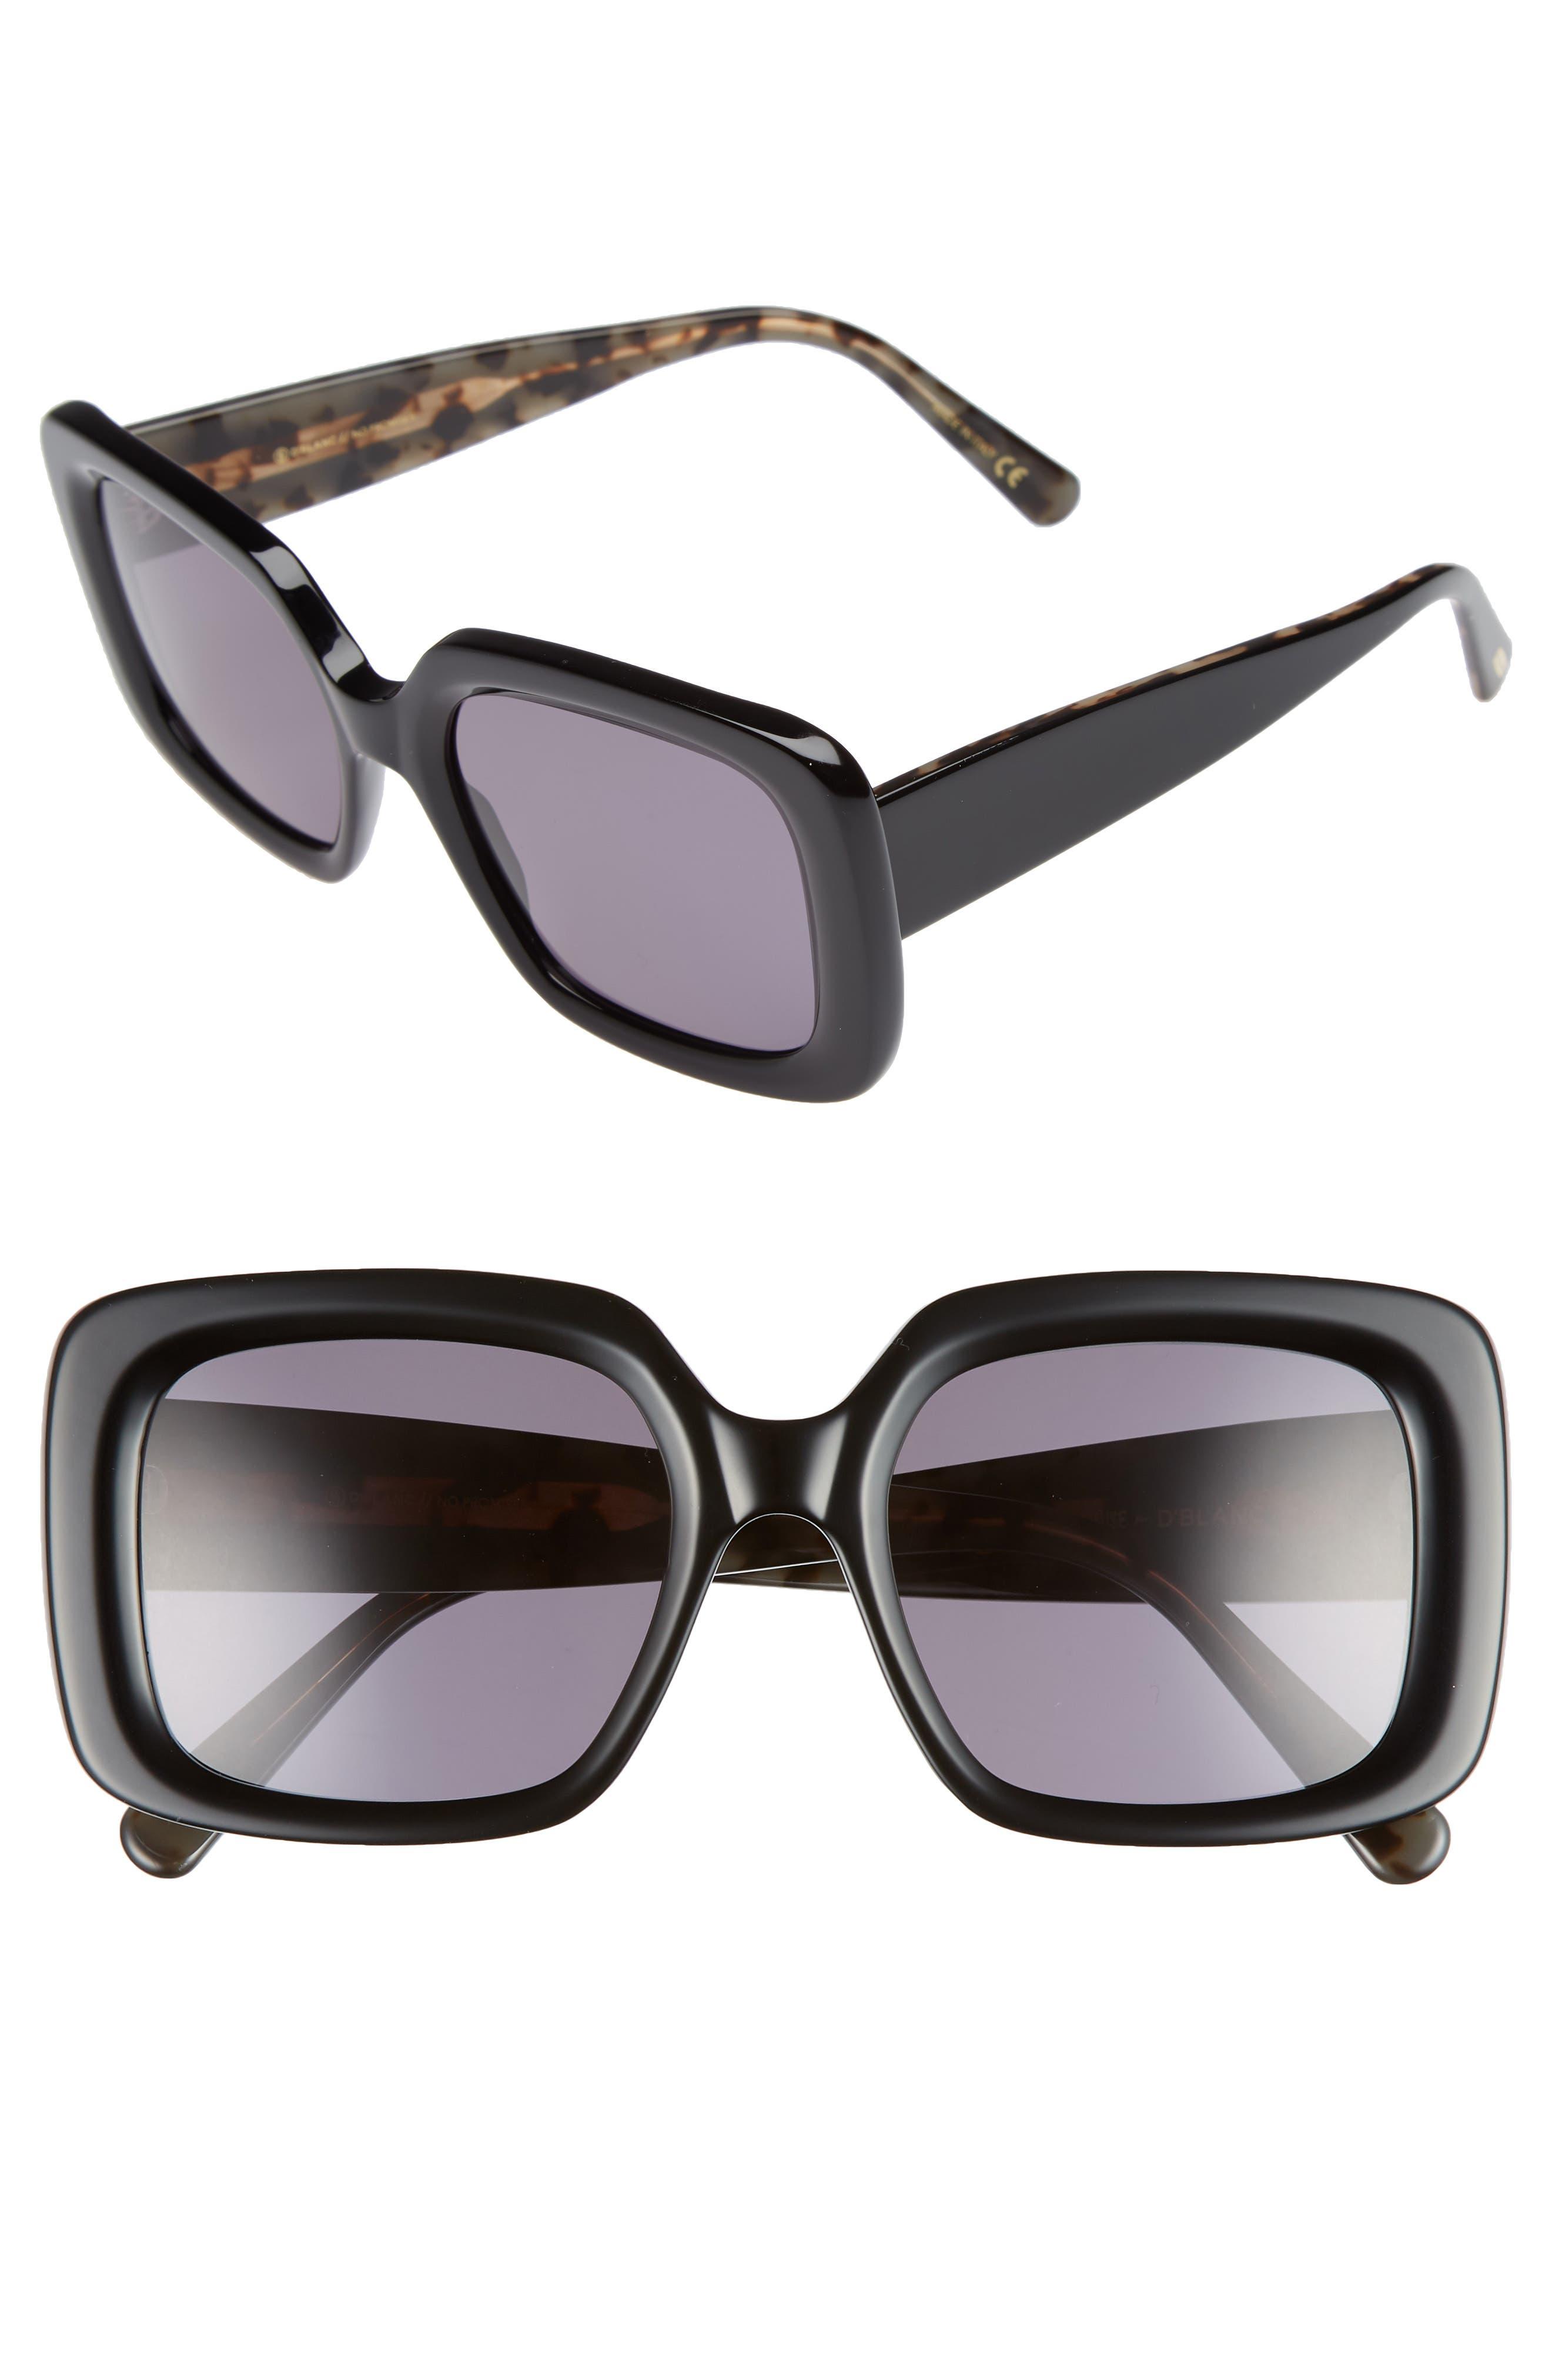 D'BLANC No Promises 53mm Sunglasses,                             Main thumbnail 1, color,                             001